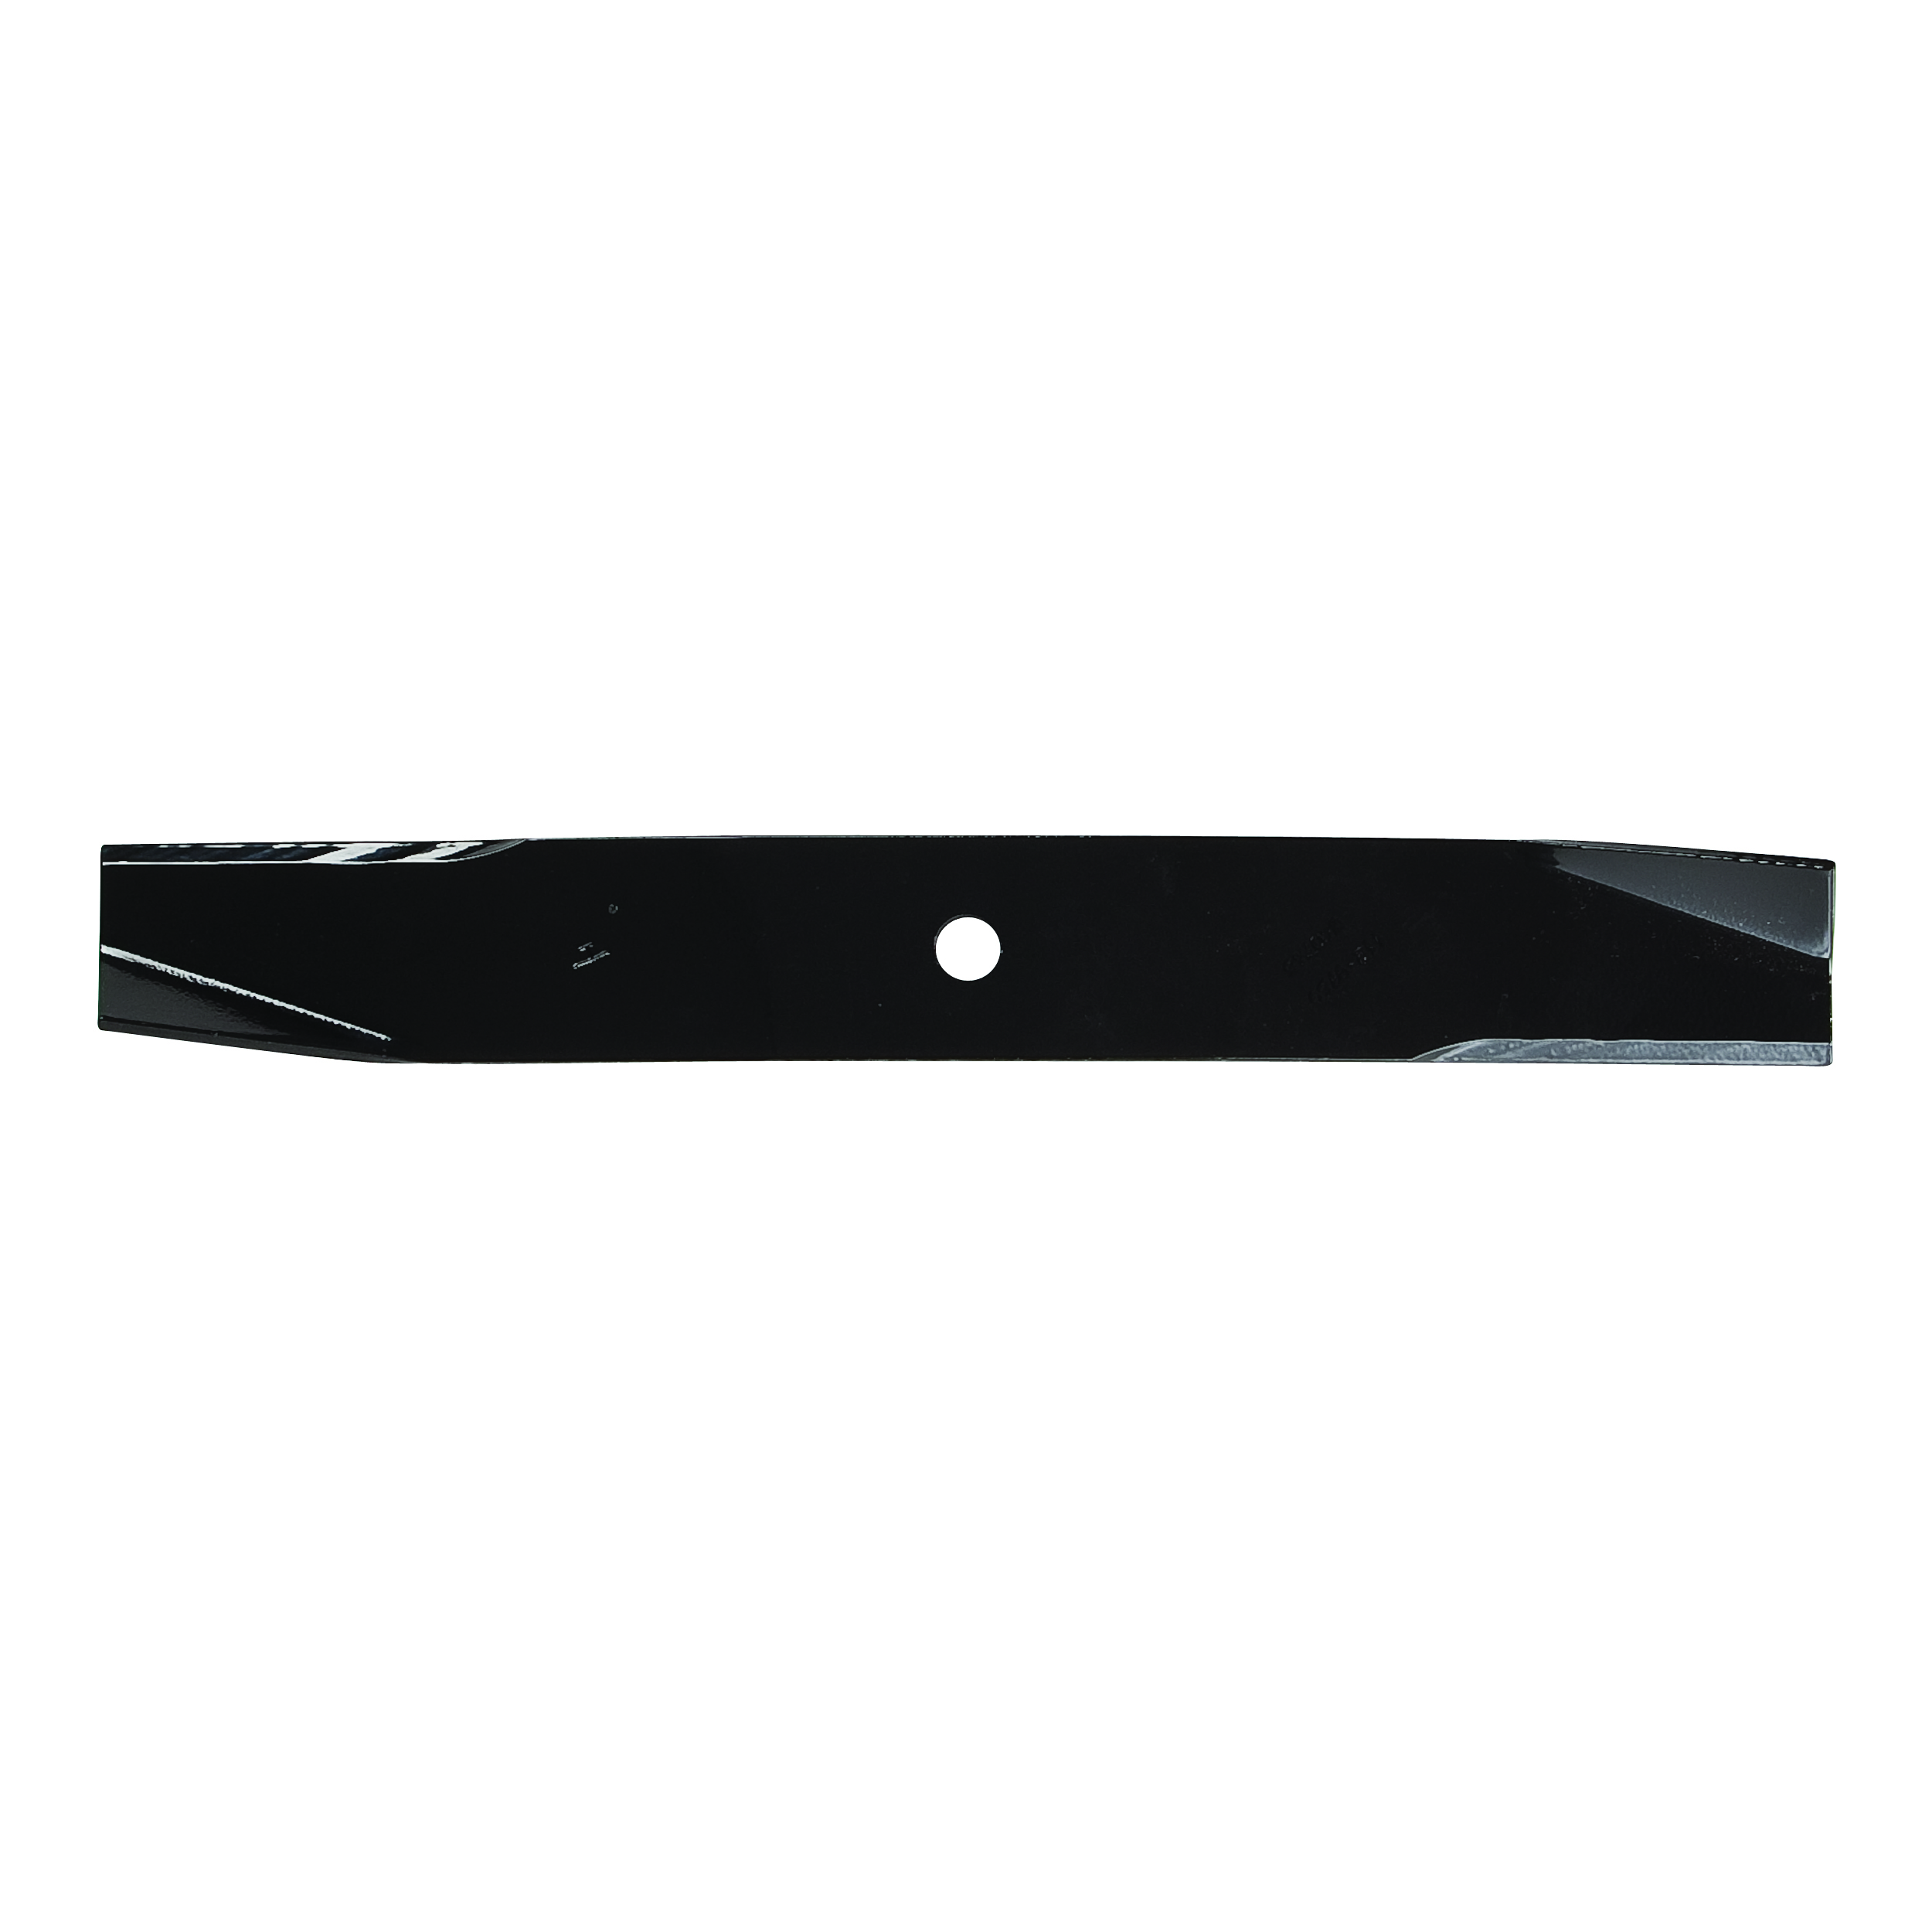 Toro Mower Blades : Standard lawn mower blade for toro